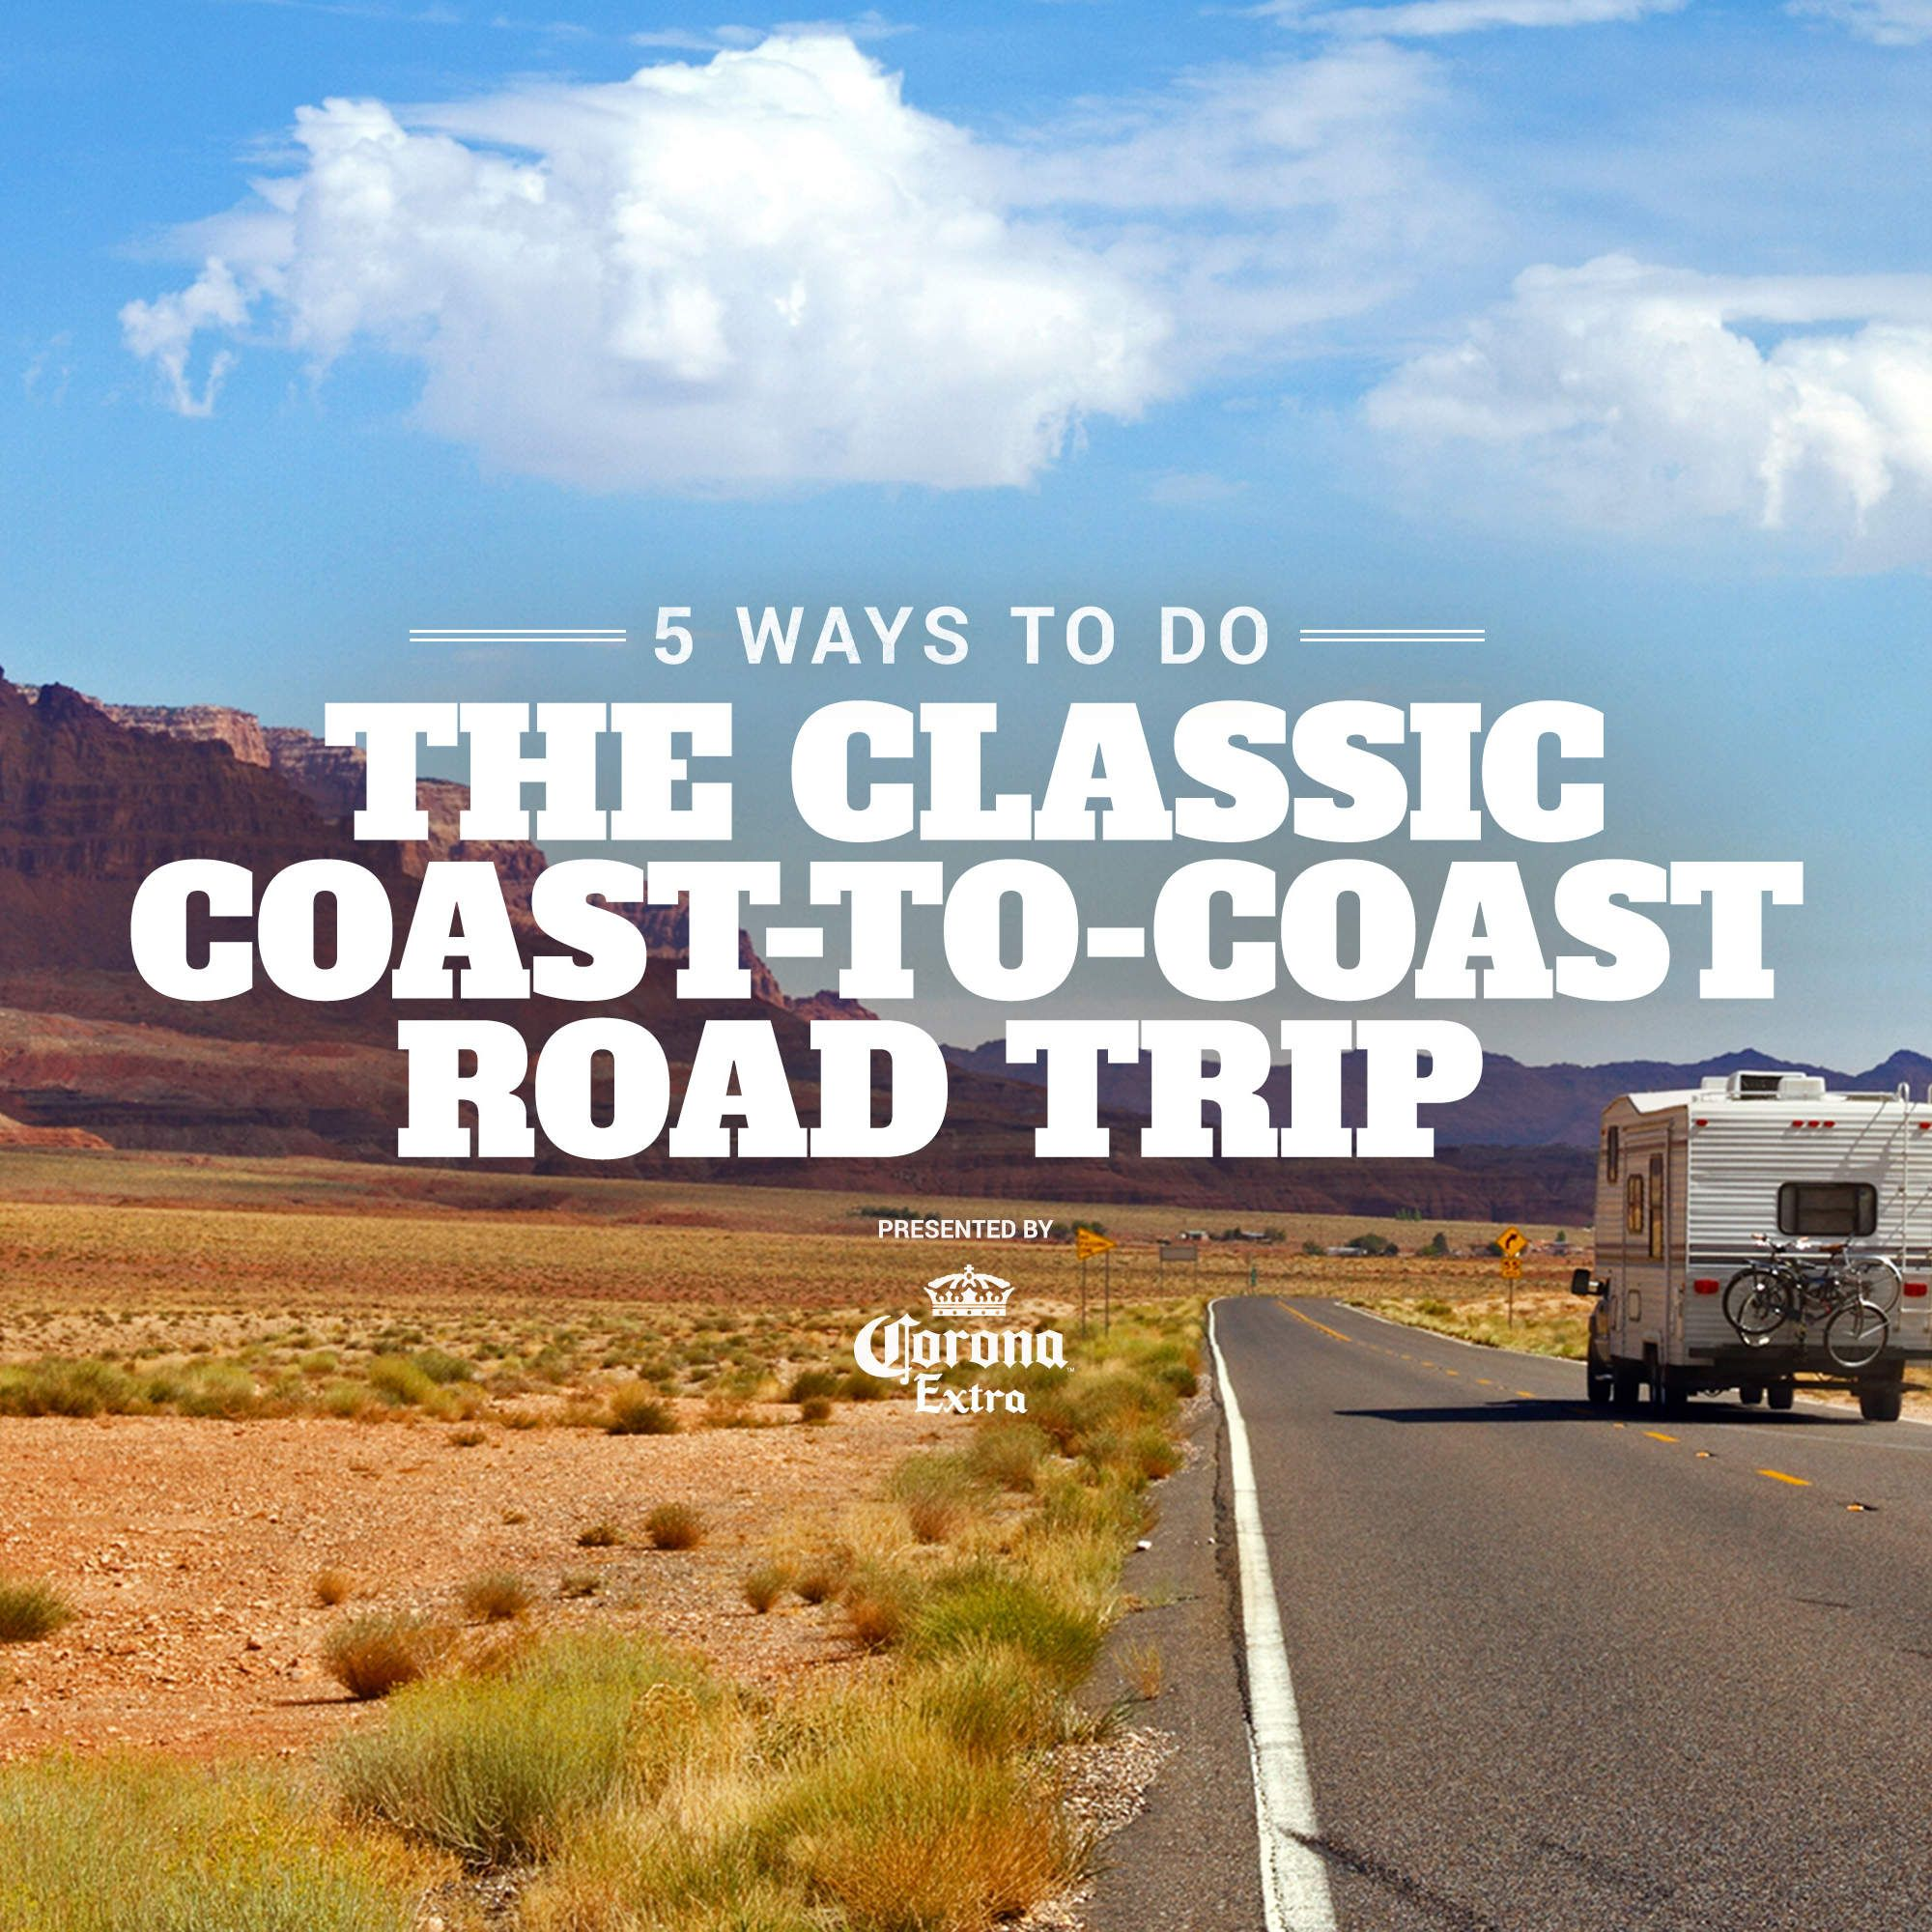 Road Trip: 5 Ways To Do The Classic Coast-to-Coast Road Trip